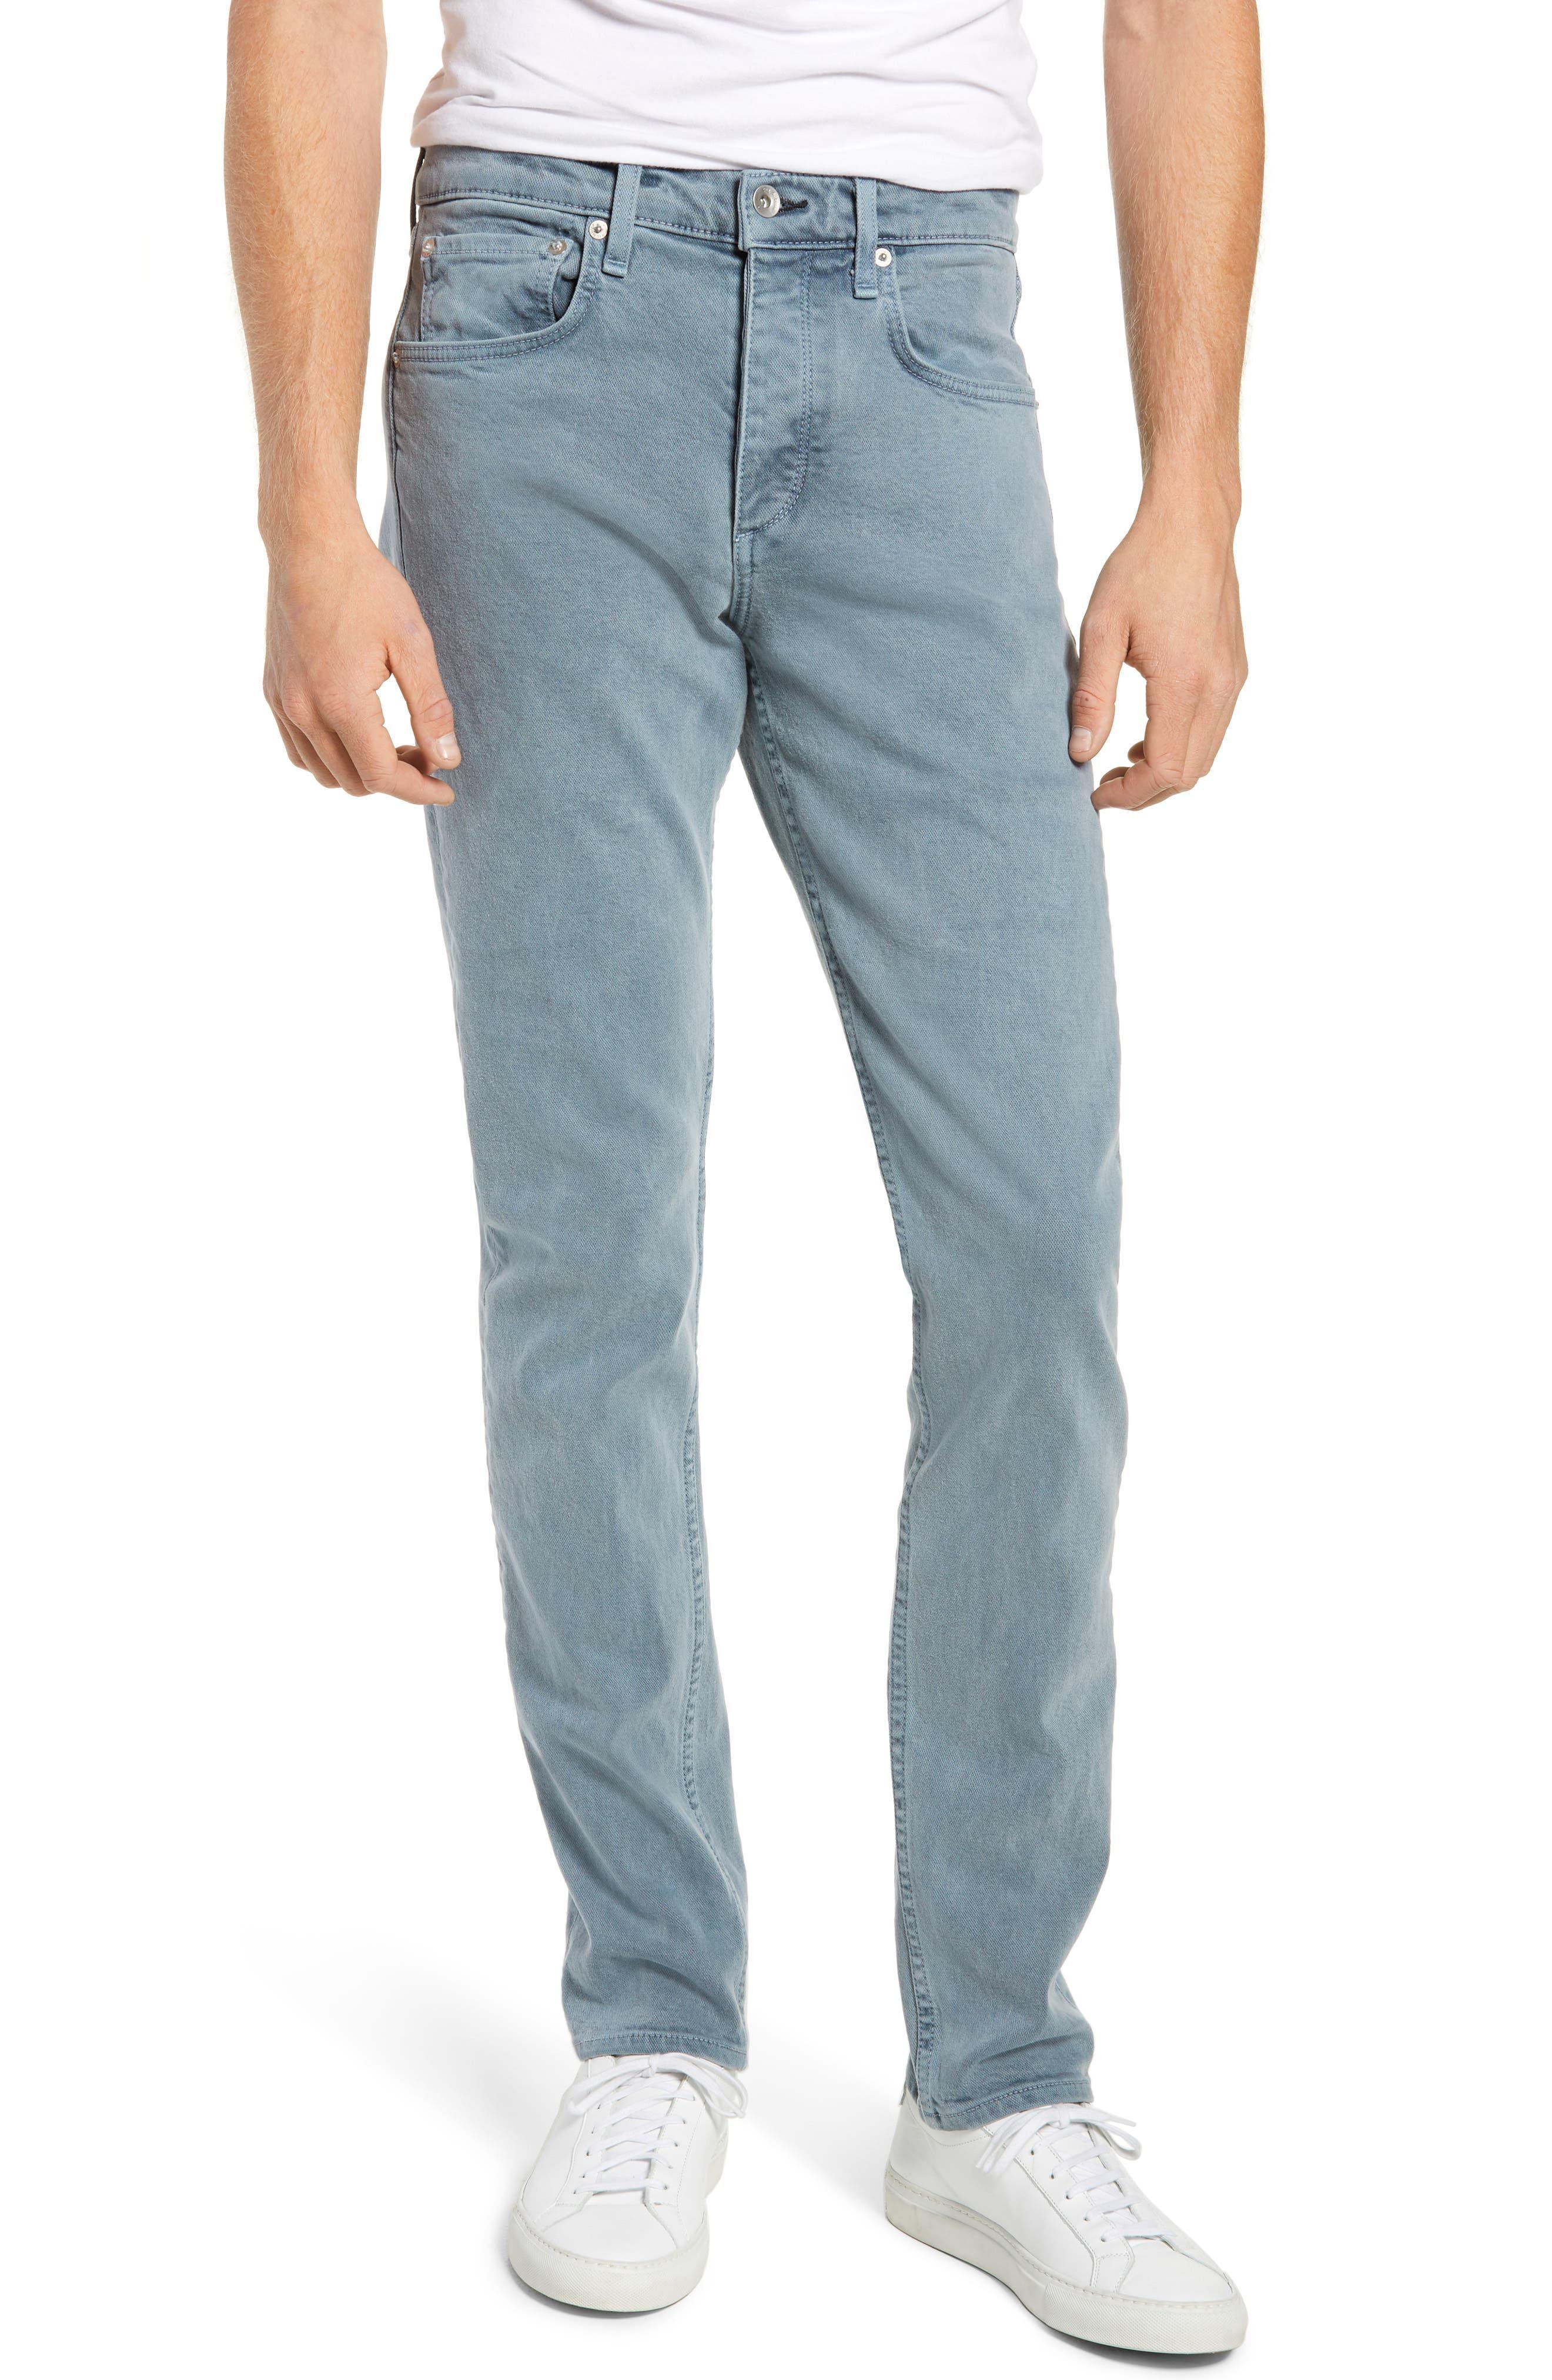 RAG & BONE,                             Fit 2 Slim Fit Jeans,                             Main thumbnail 1, color,                             SAUSALITO